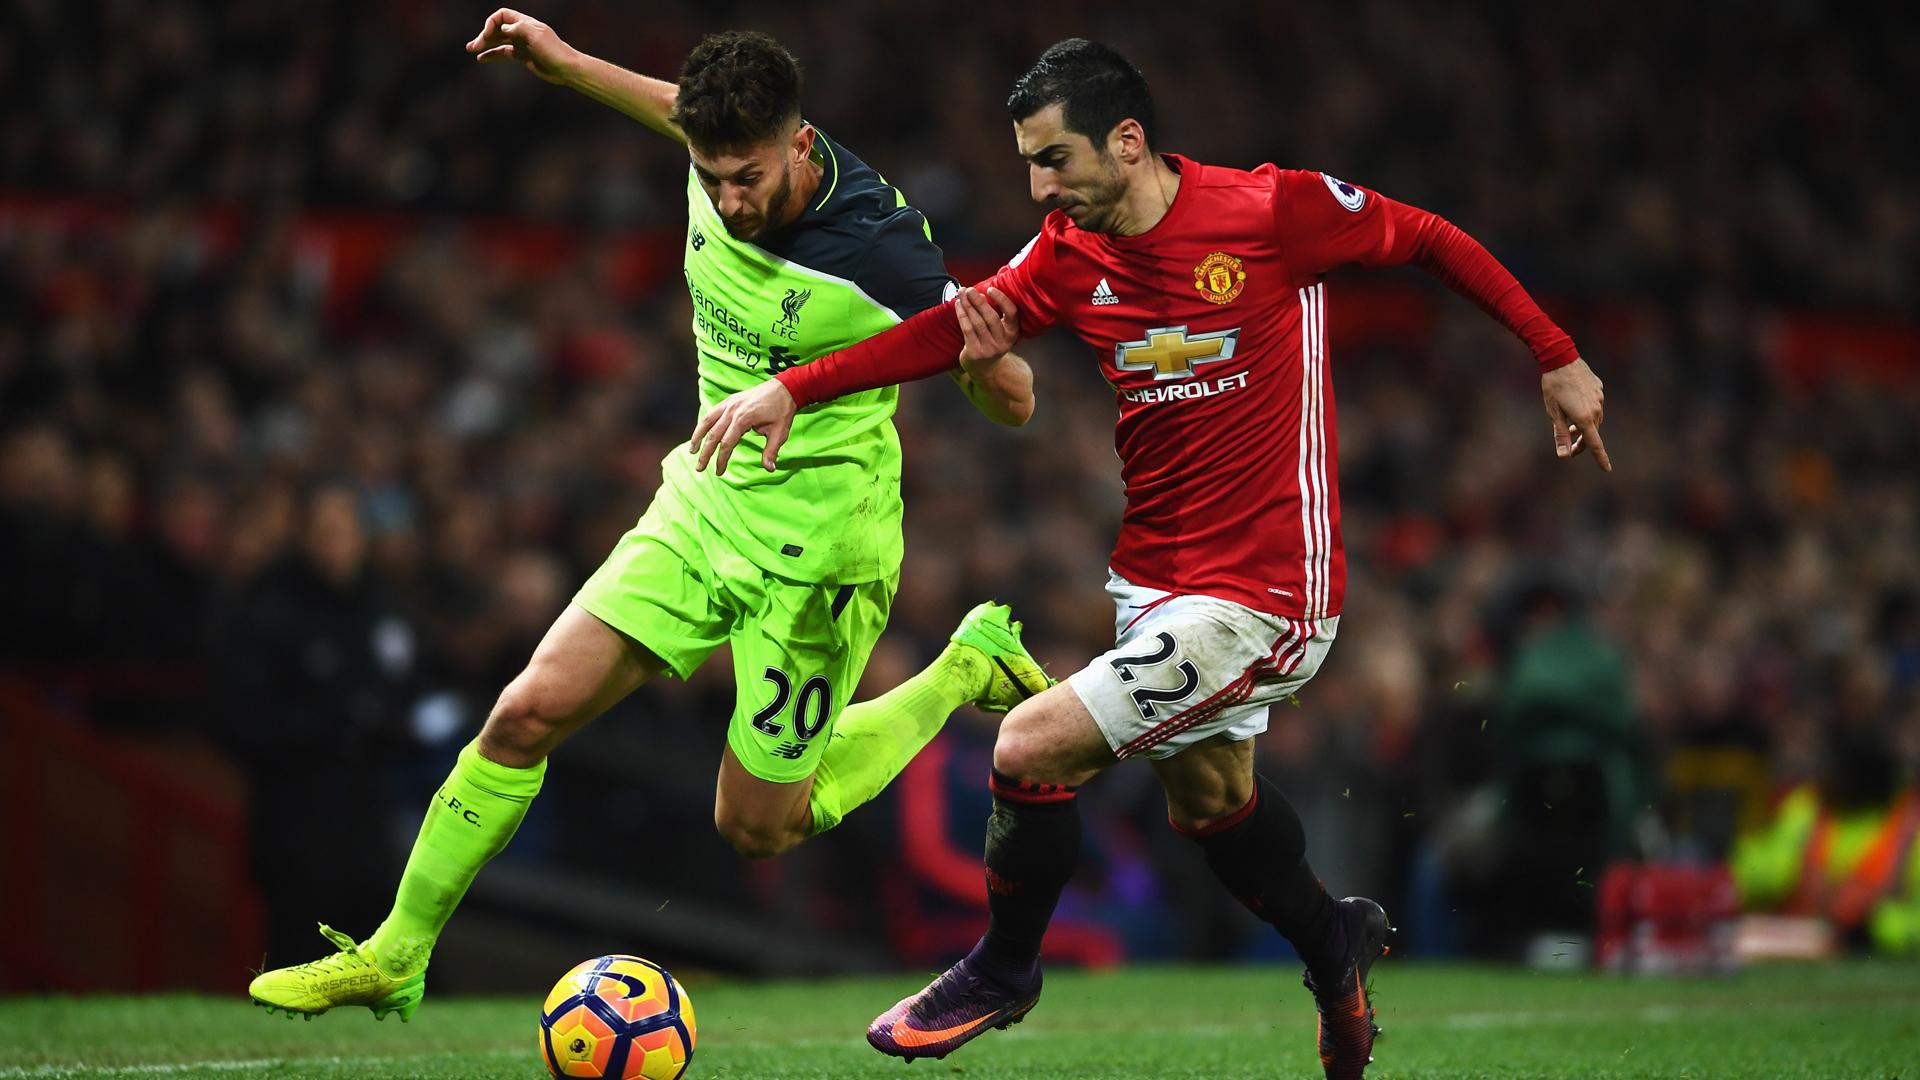 Mkhitaryan Lallana Liverpool Manchester United 01152015